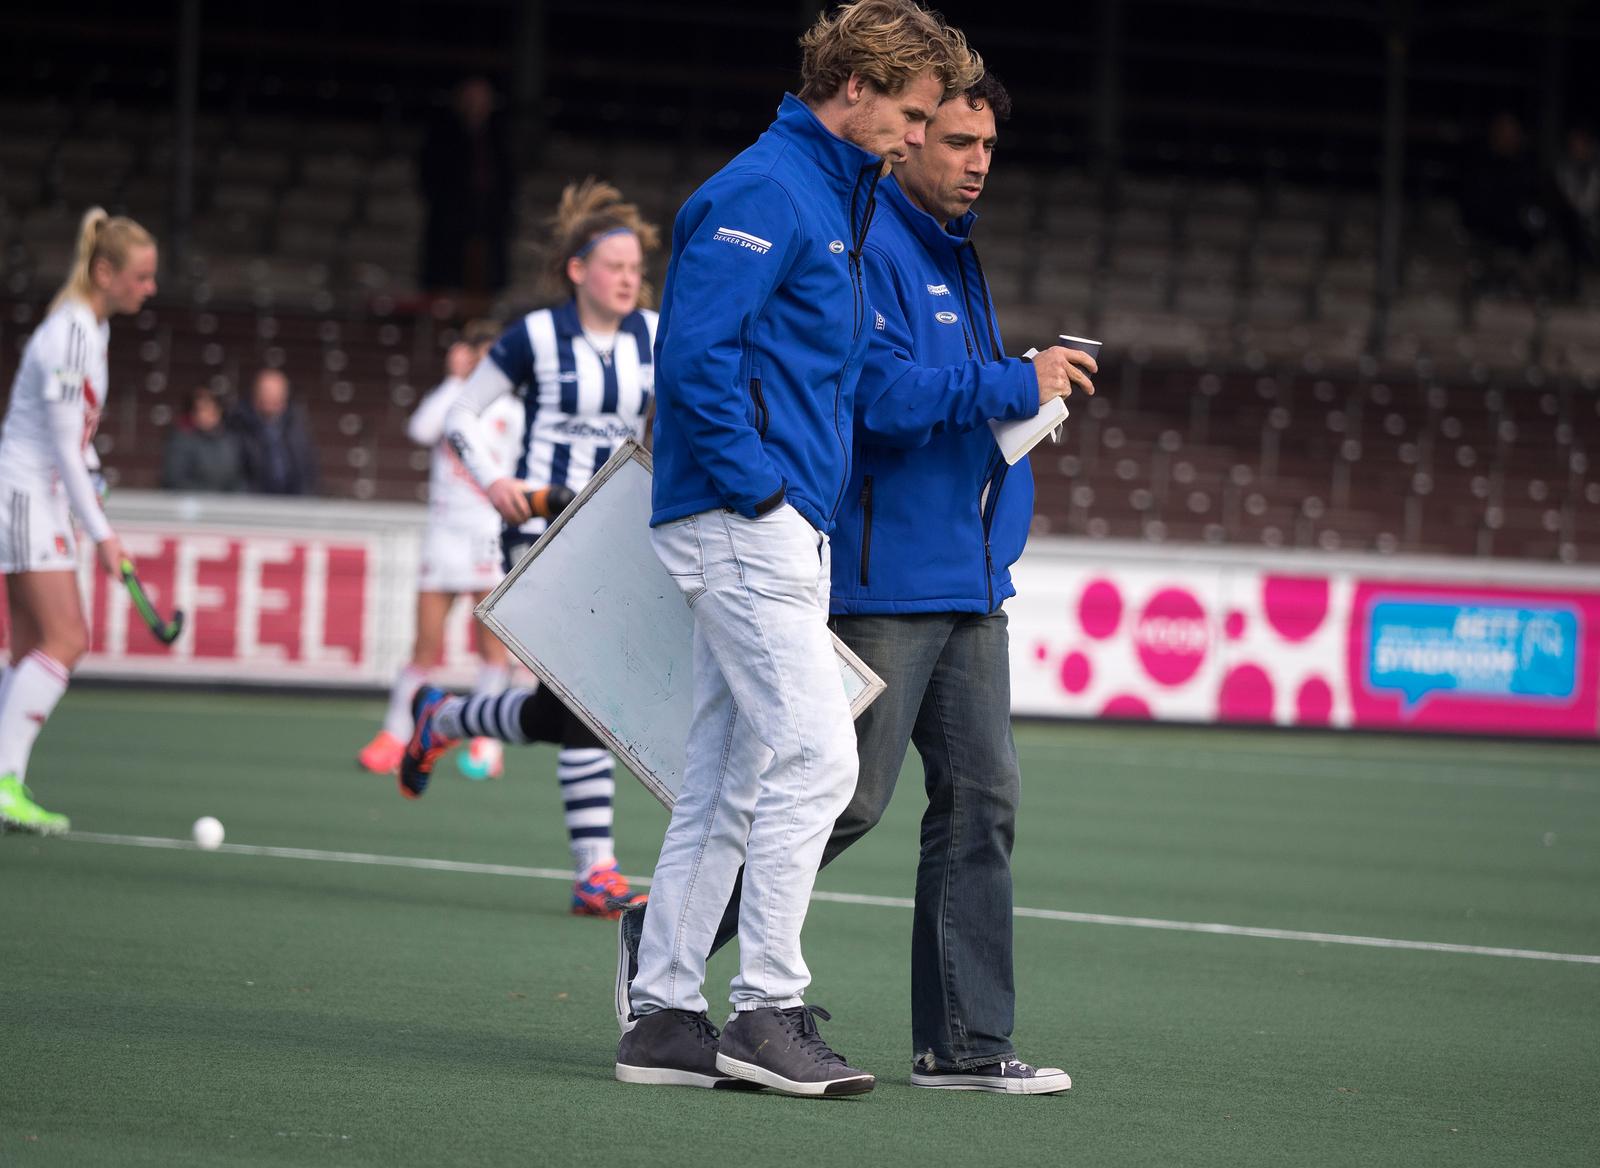 Erik van Driel vanaf nieuwe seizoen coach hdm heren